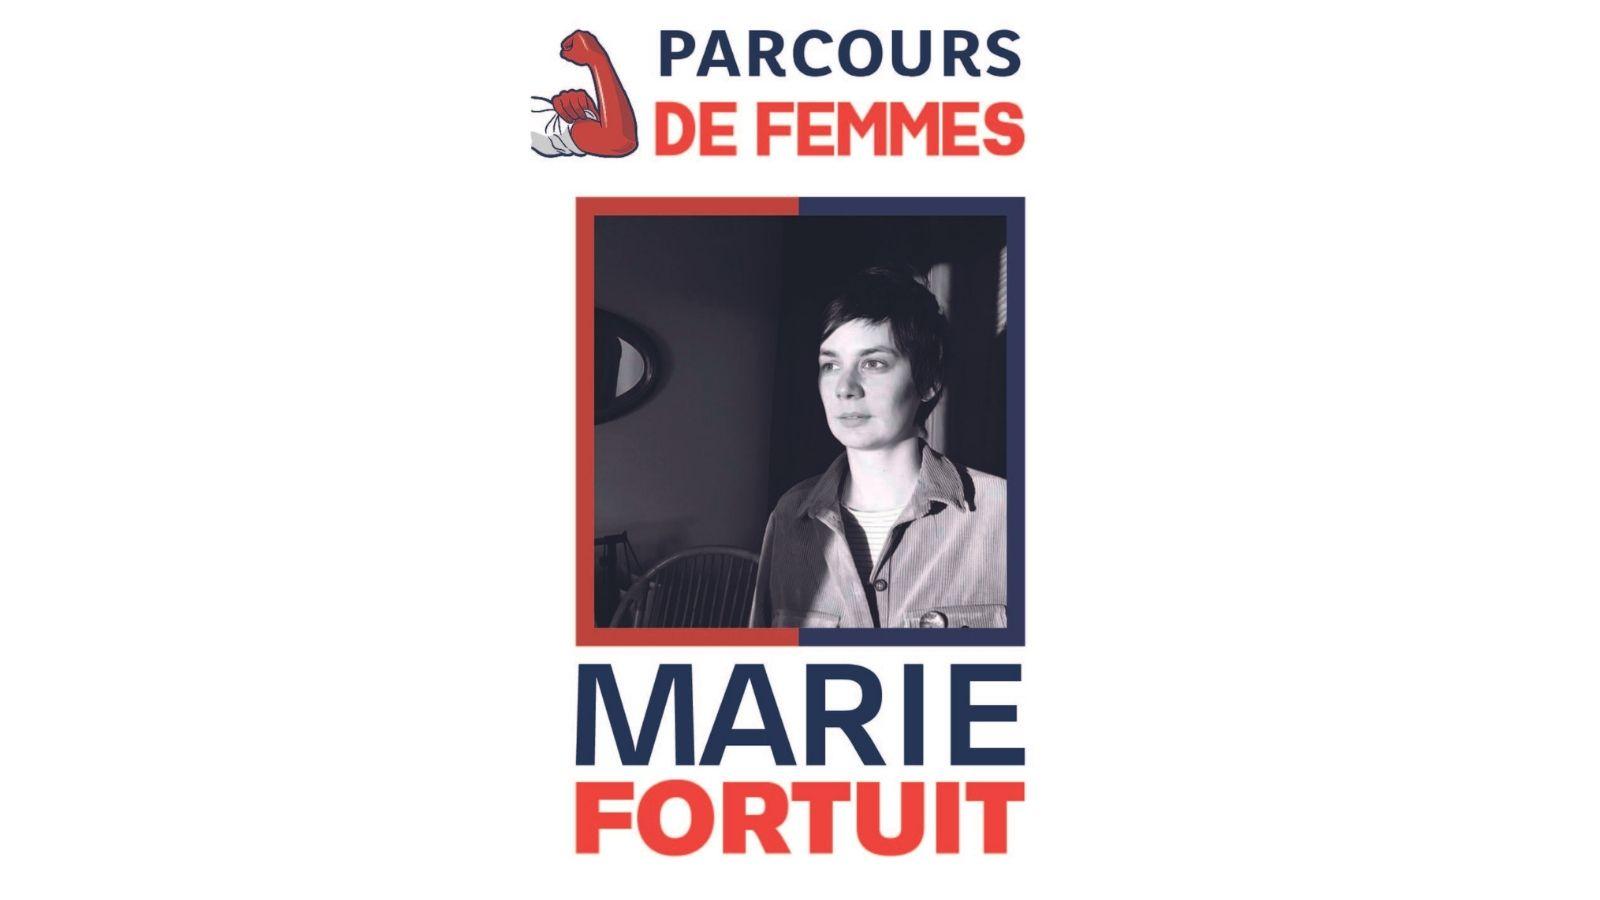 Marie Fortuit